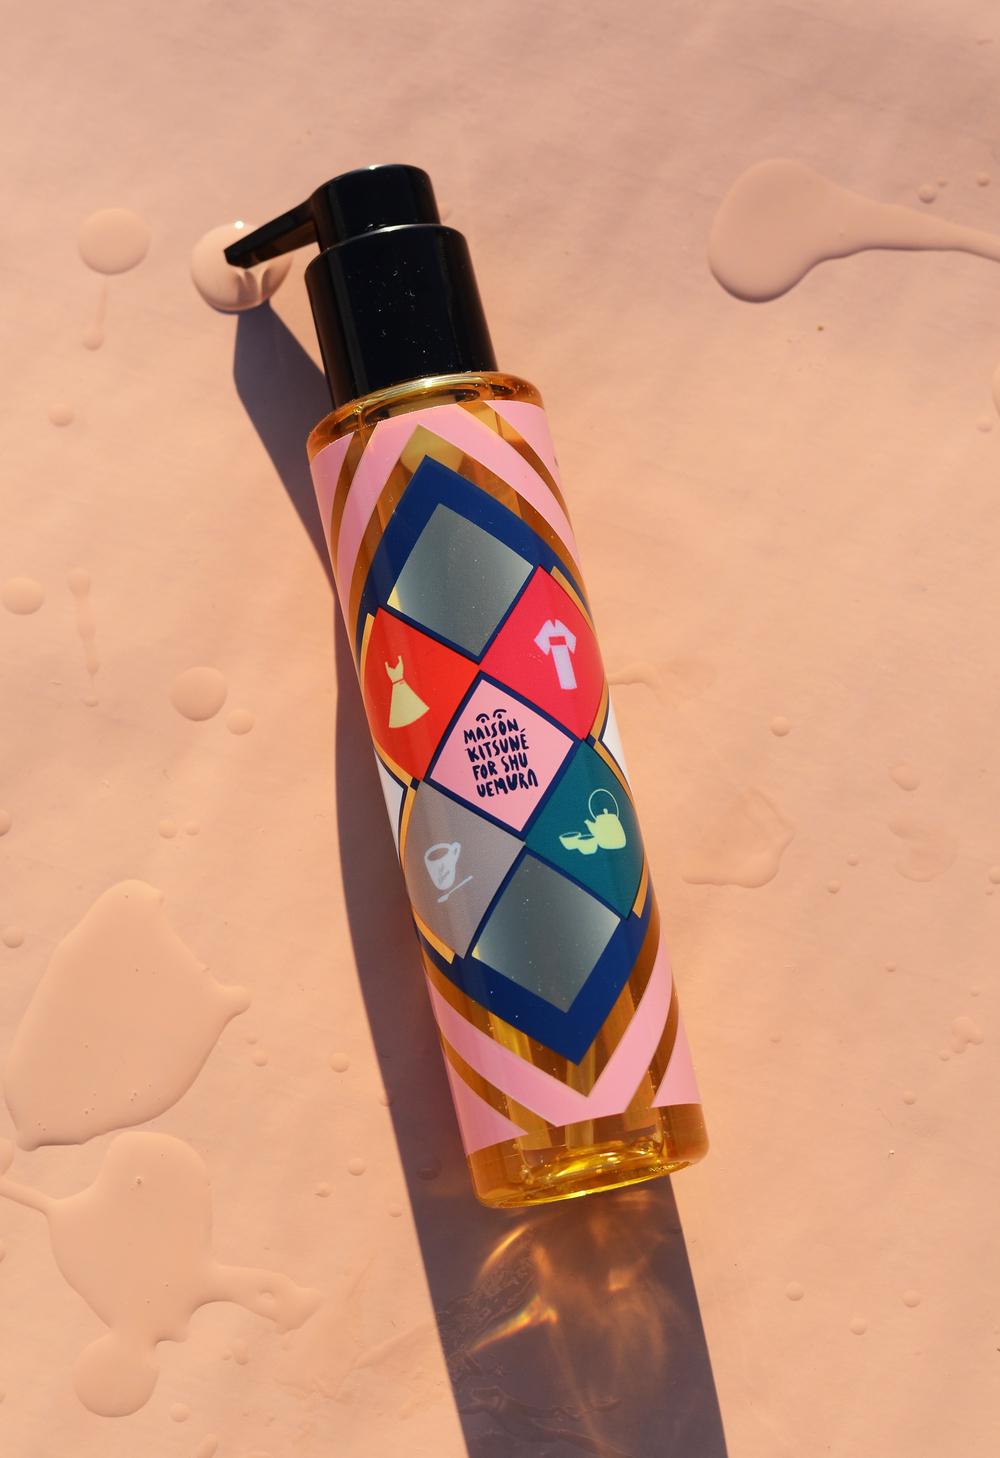 Maison Kitsunéx Shu Uemura Protective Oil, $69